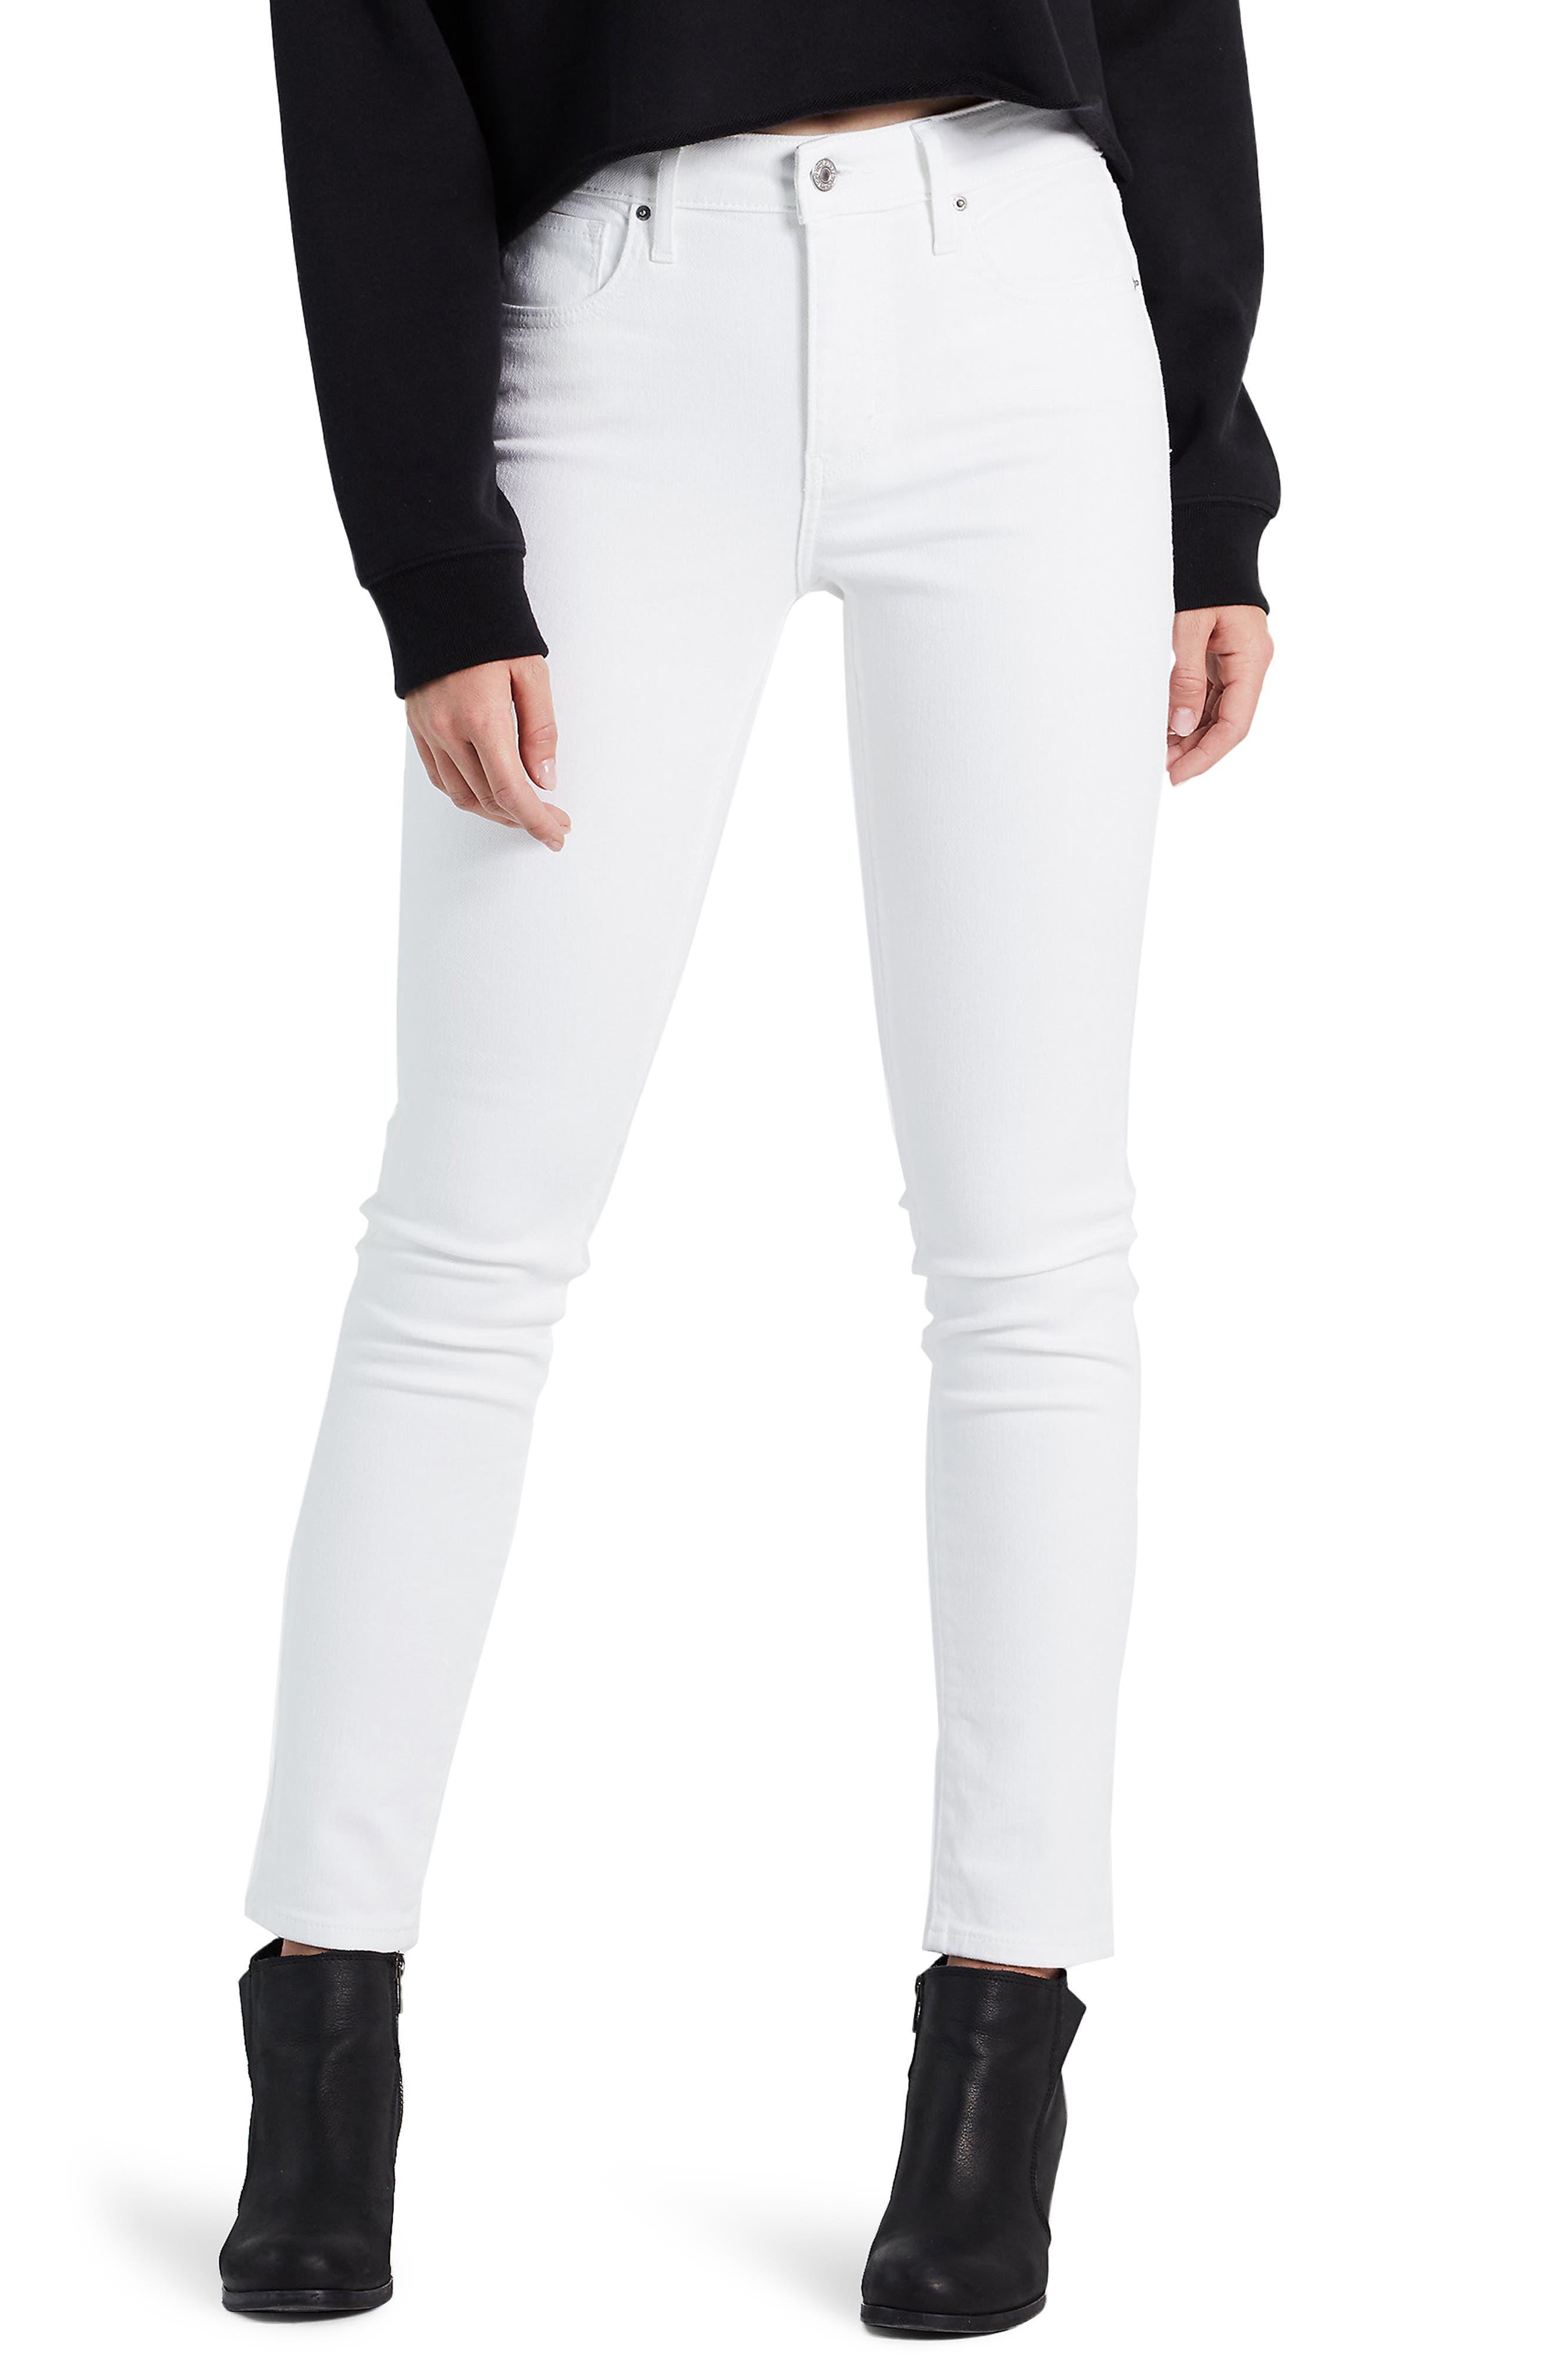 Women's Levi's 721(TM) High Waist Skinny Jeans,  23 x 30 - White